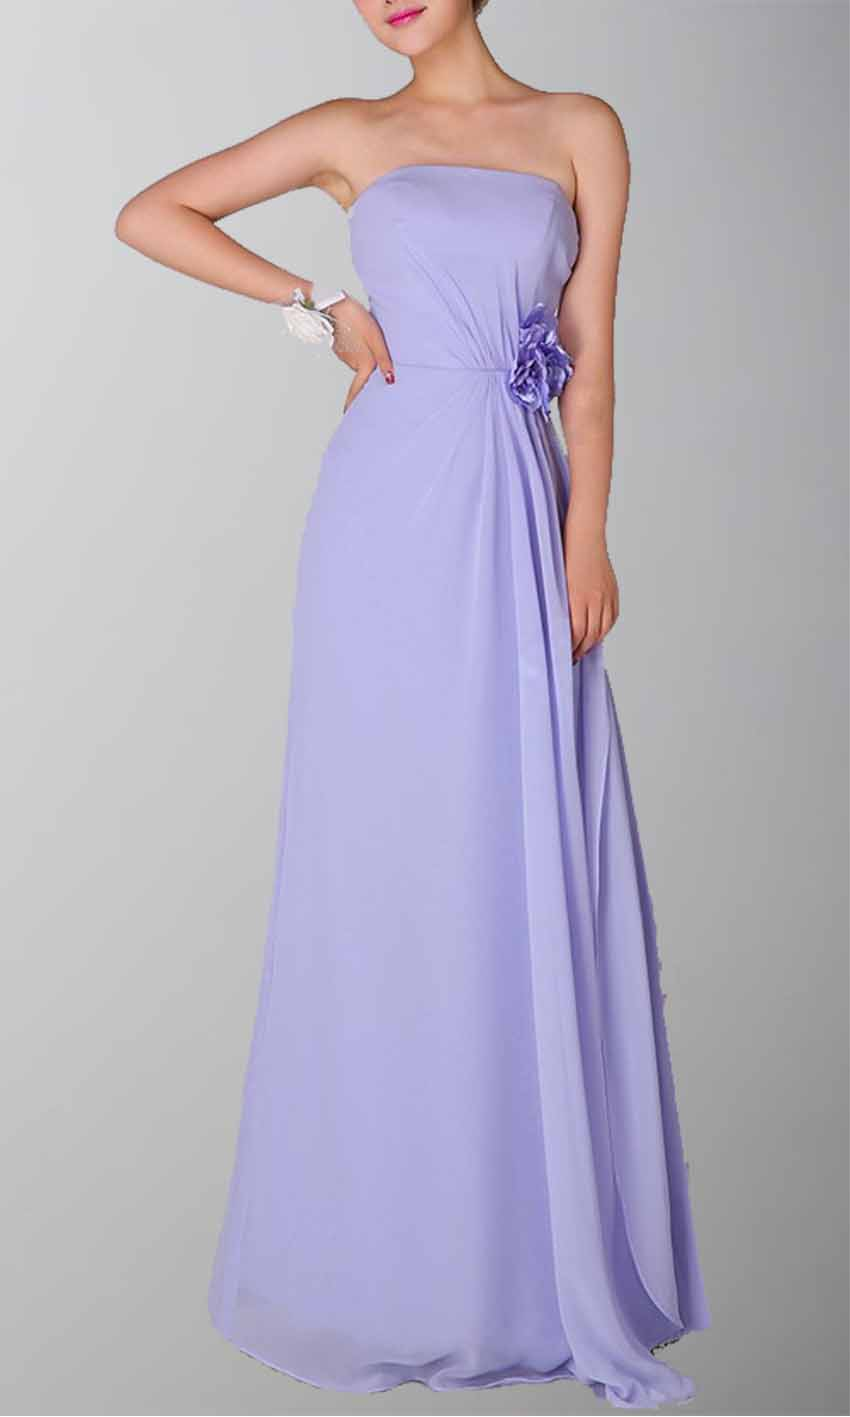 Cheap Lilac Bridesmaid Dresses Choice Image - Braidsmaid Dress ...